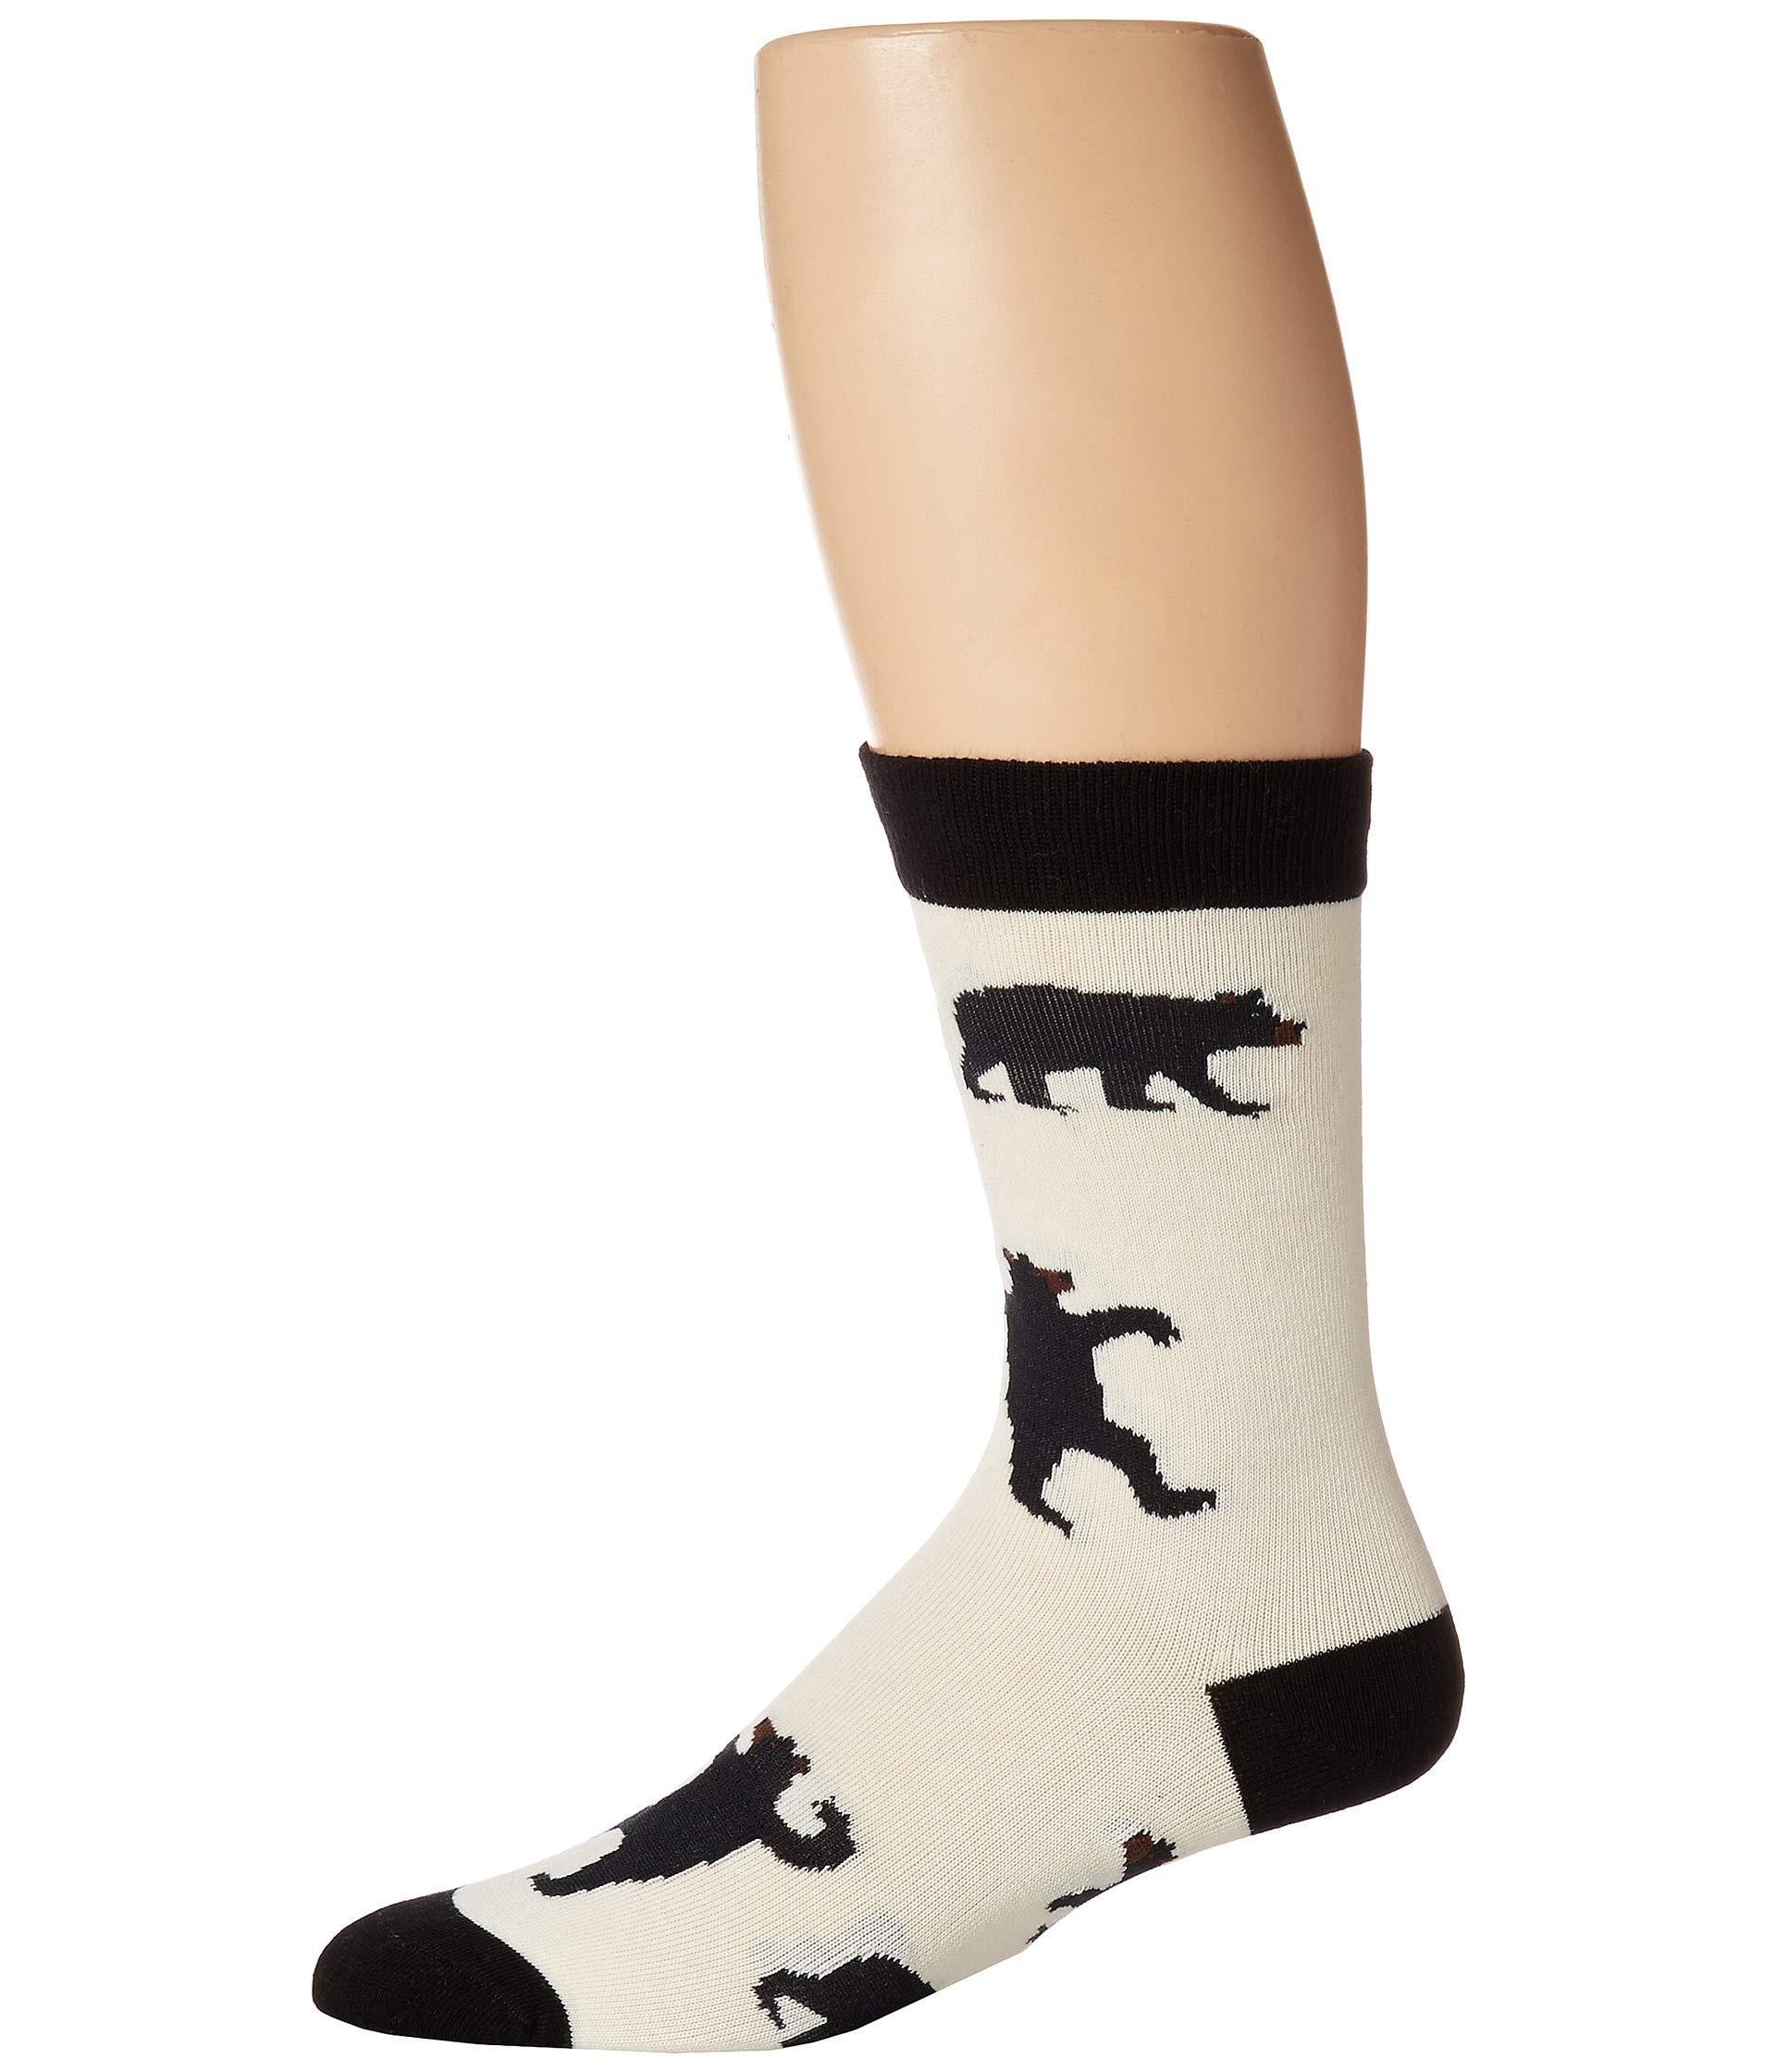 Natural In Lbh Socks Hatley Bears Balls Black wY6qTw4Px